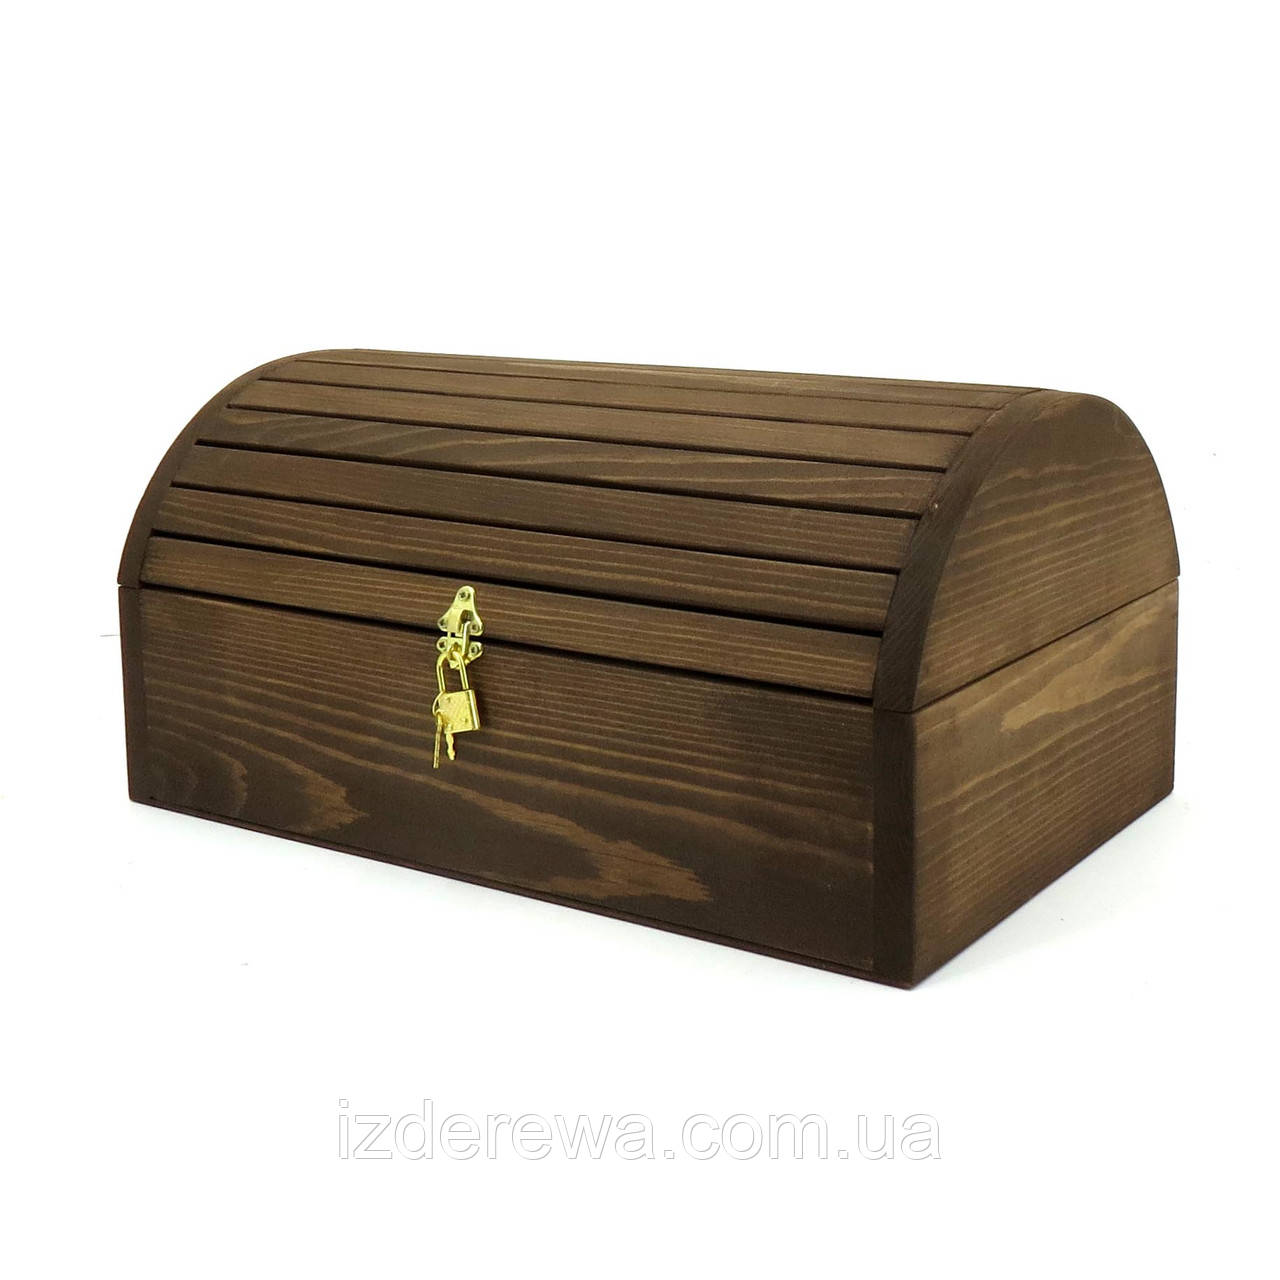 "Сундук деревянный ""Марико 40х22х20"" капучино"